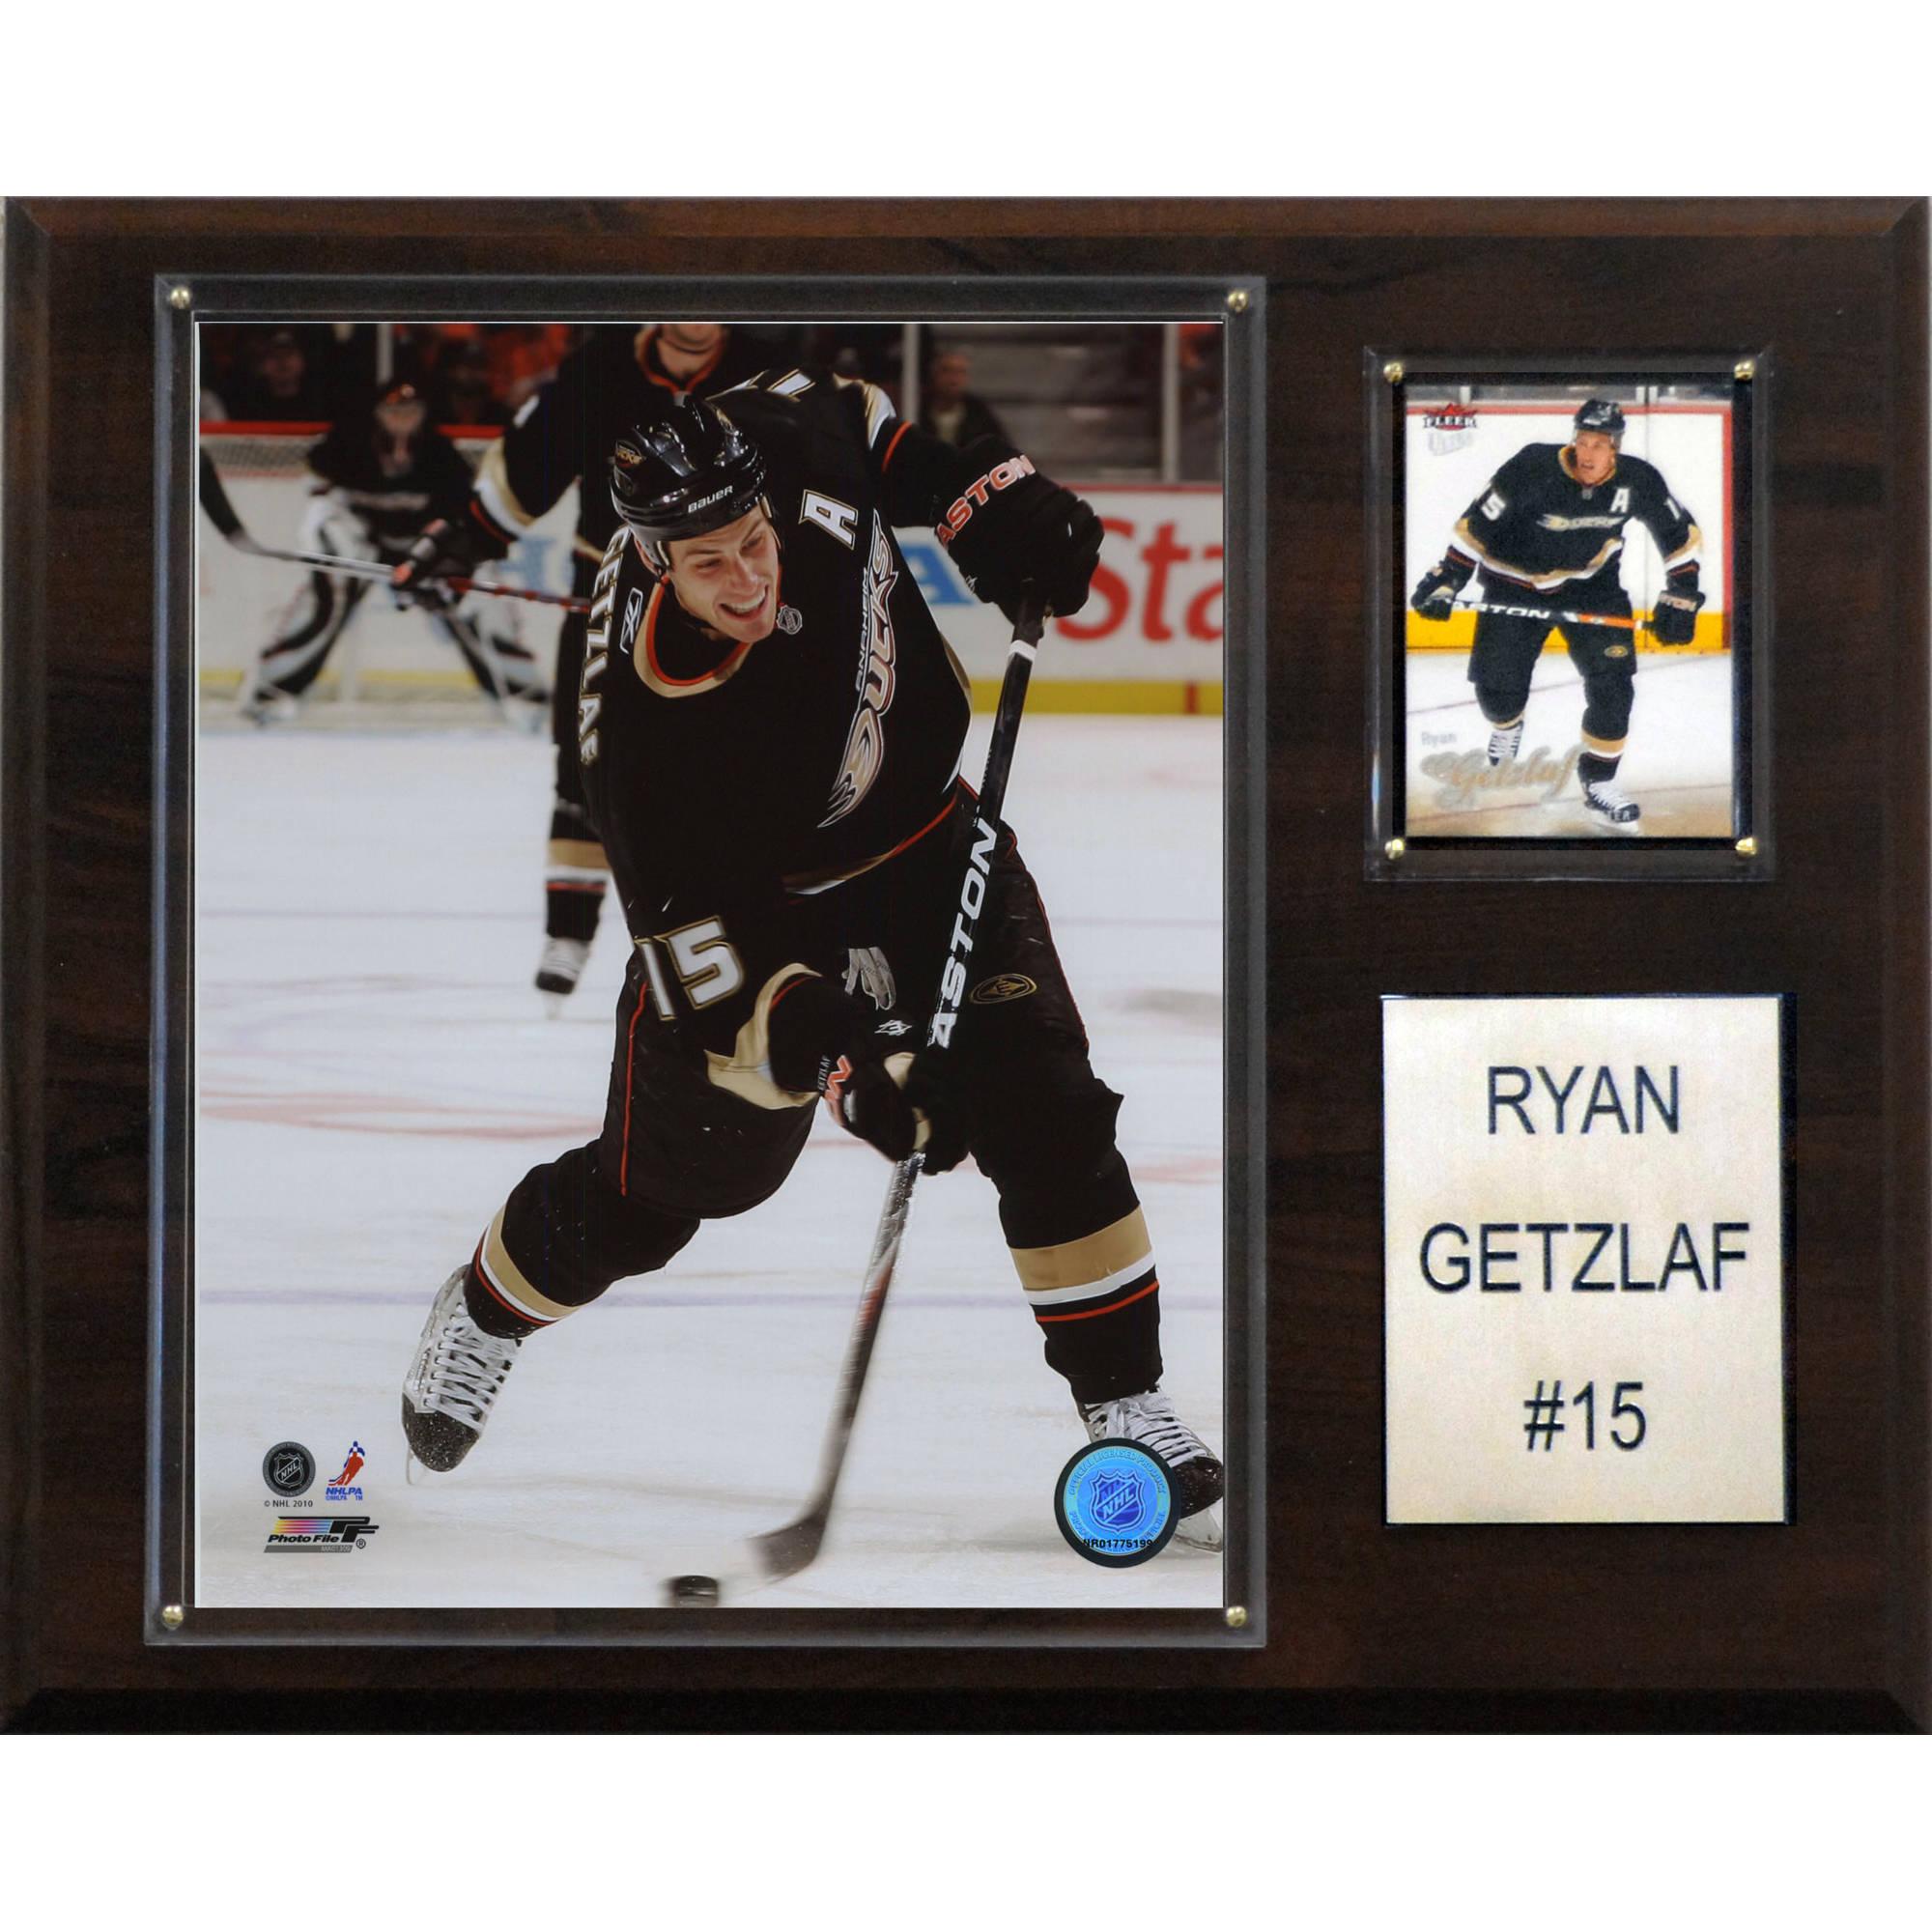 C&I Collectables NHL 12x15 Ryan Getzlaf Anaheim Ducks Player Plaque